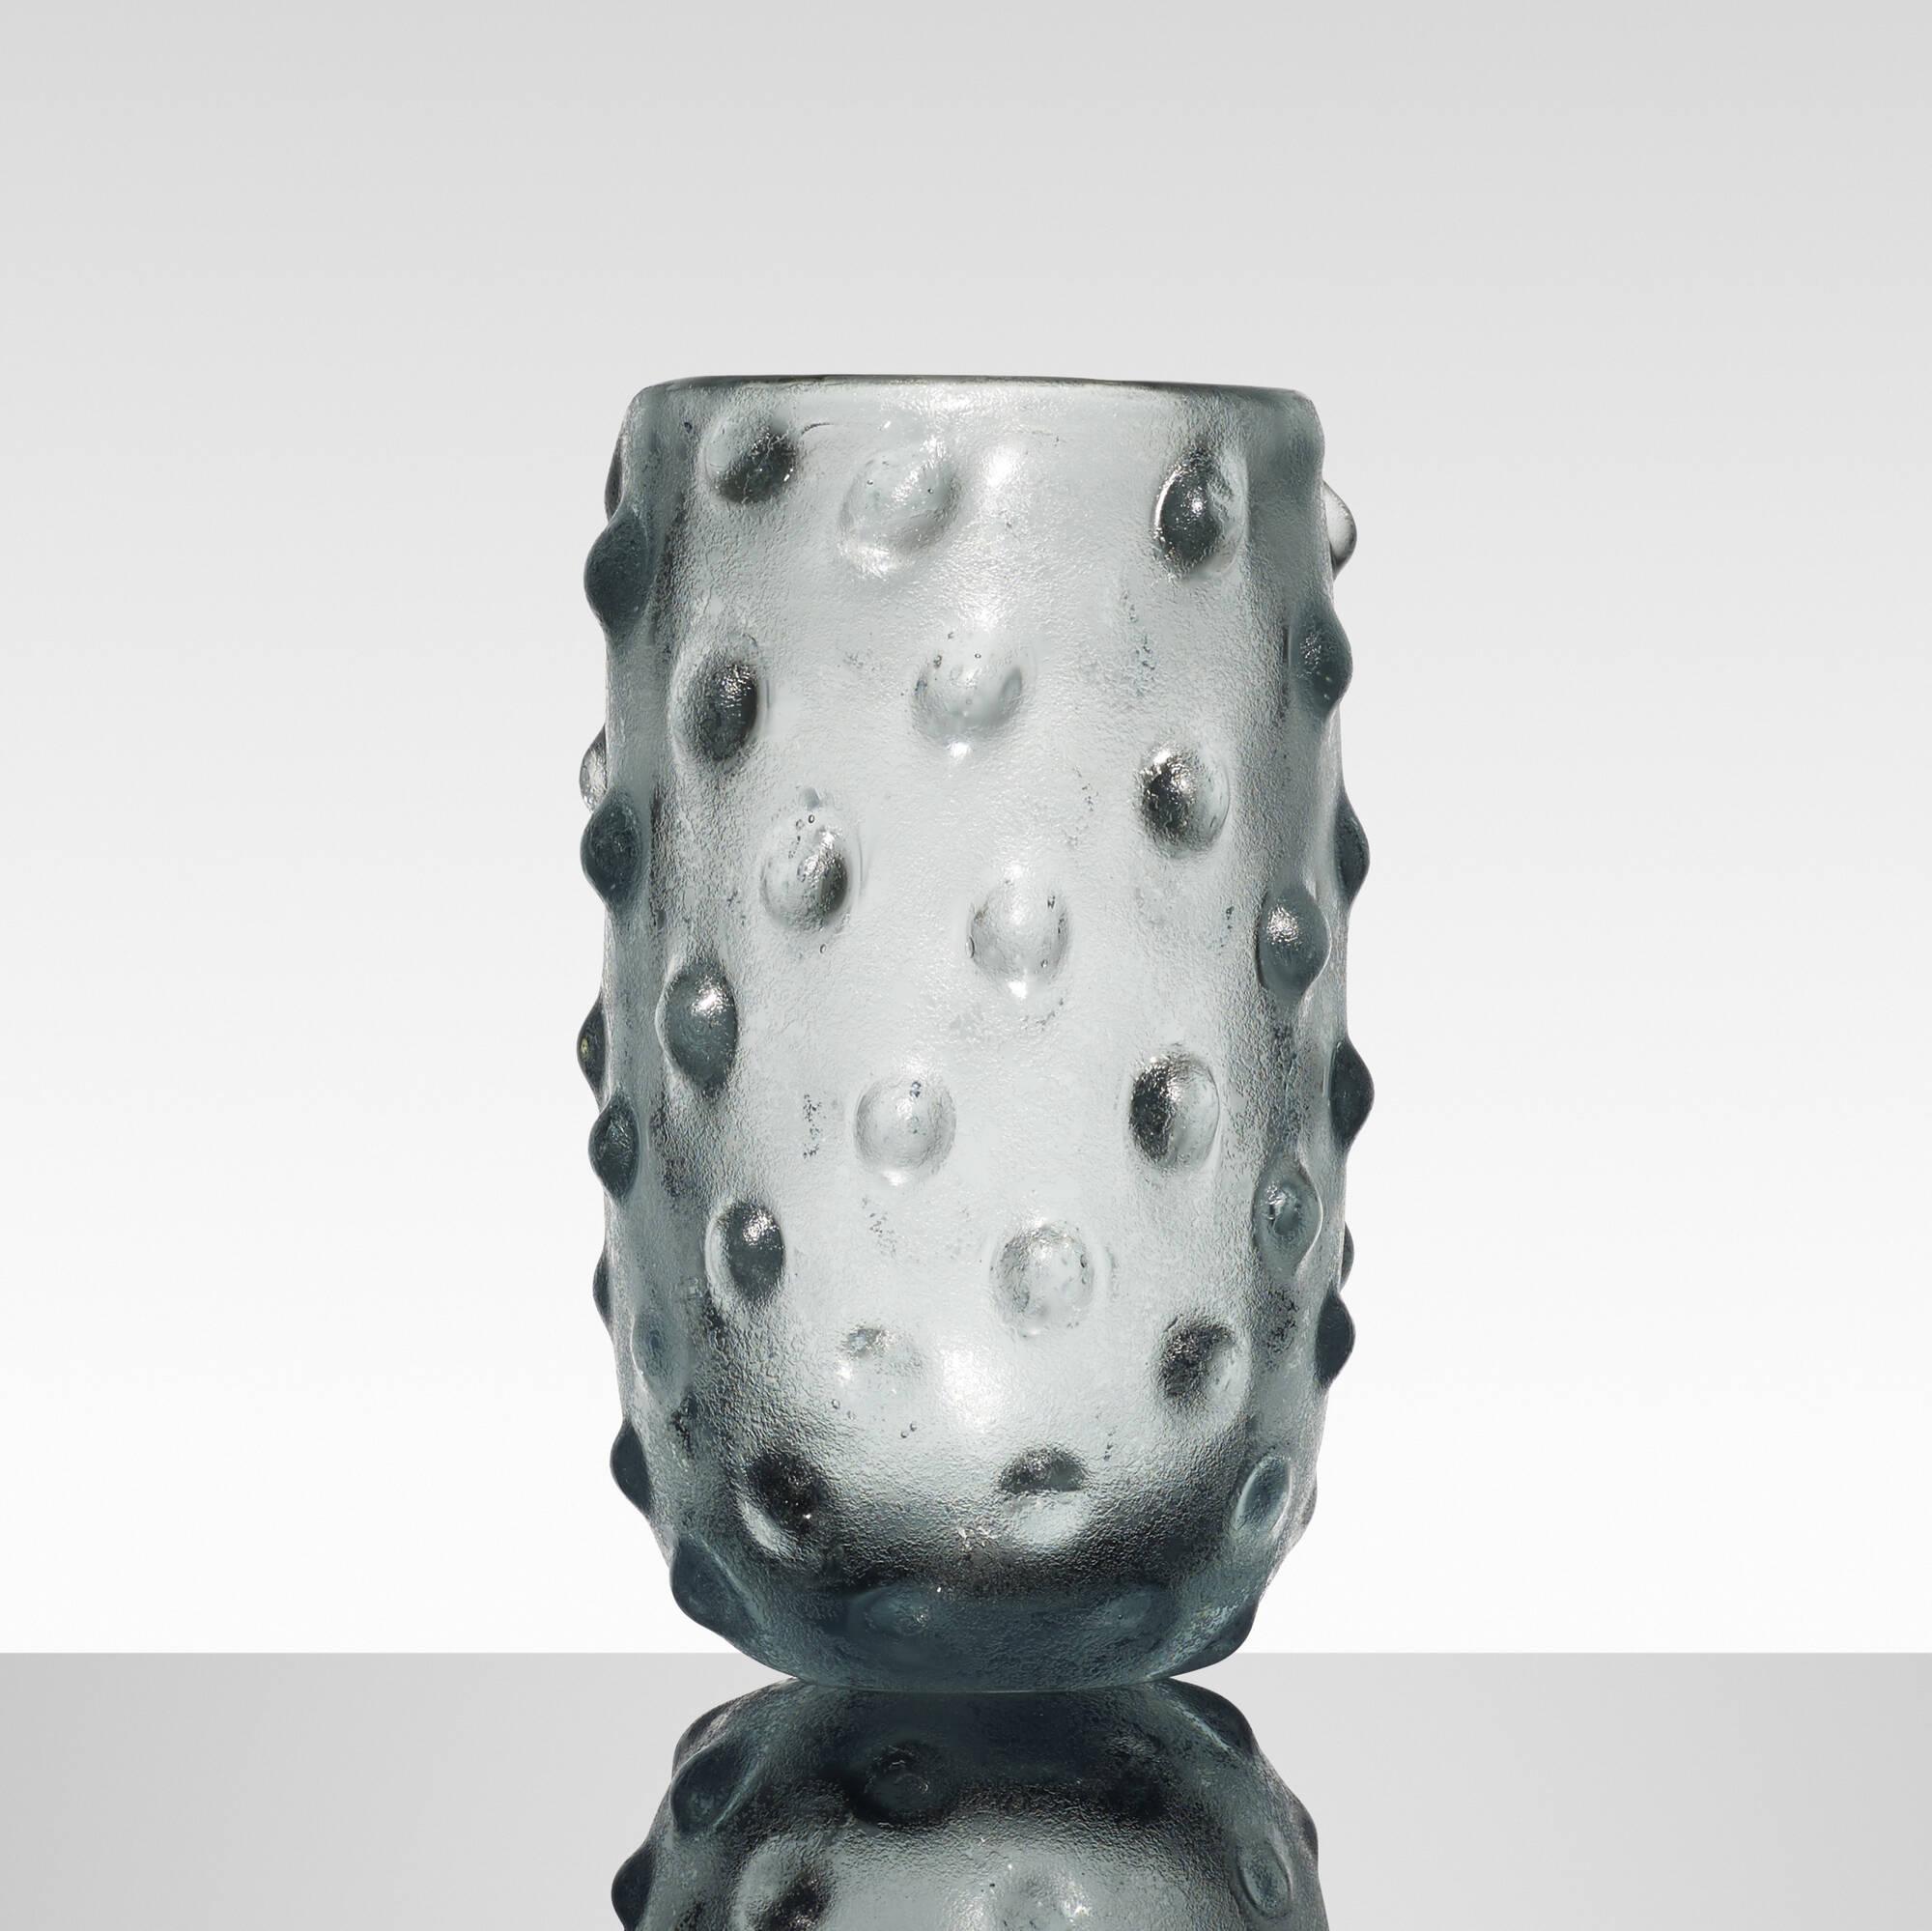 256 carlo scarpa a bugne vase important italian glass 13 june 256 carlo scarpa a bugne vase 1 of 3 floridaeventfo Image collections